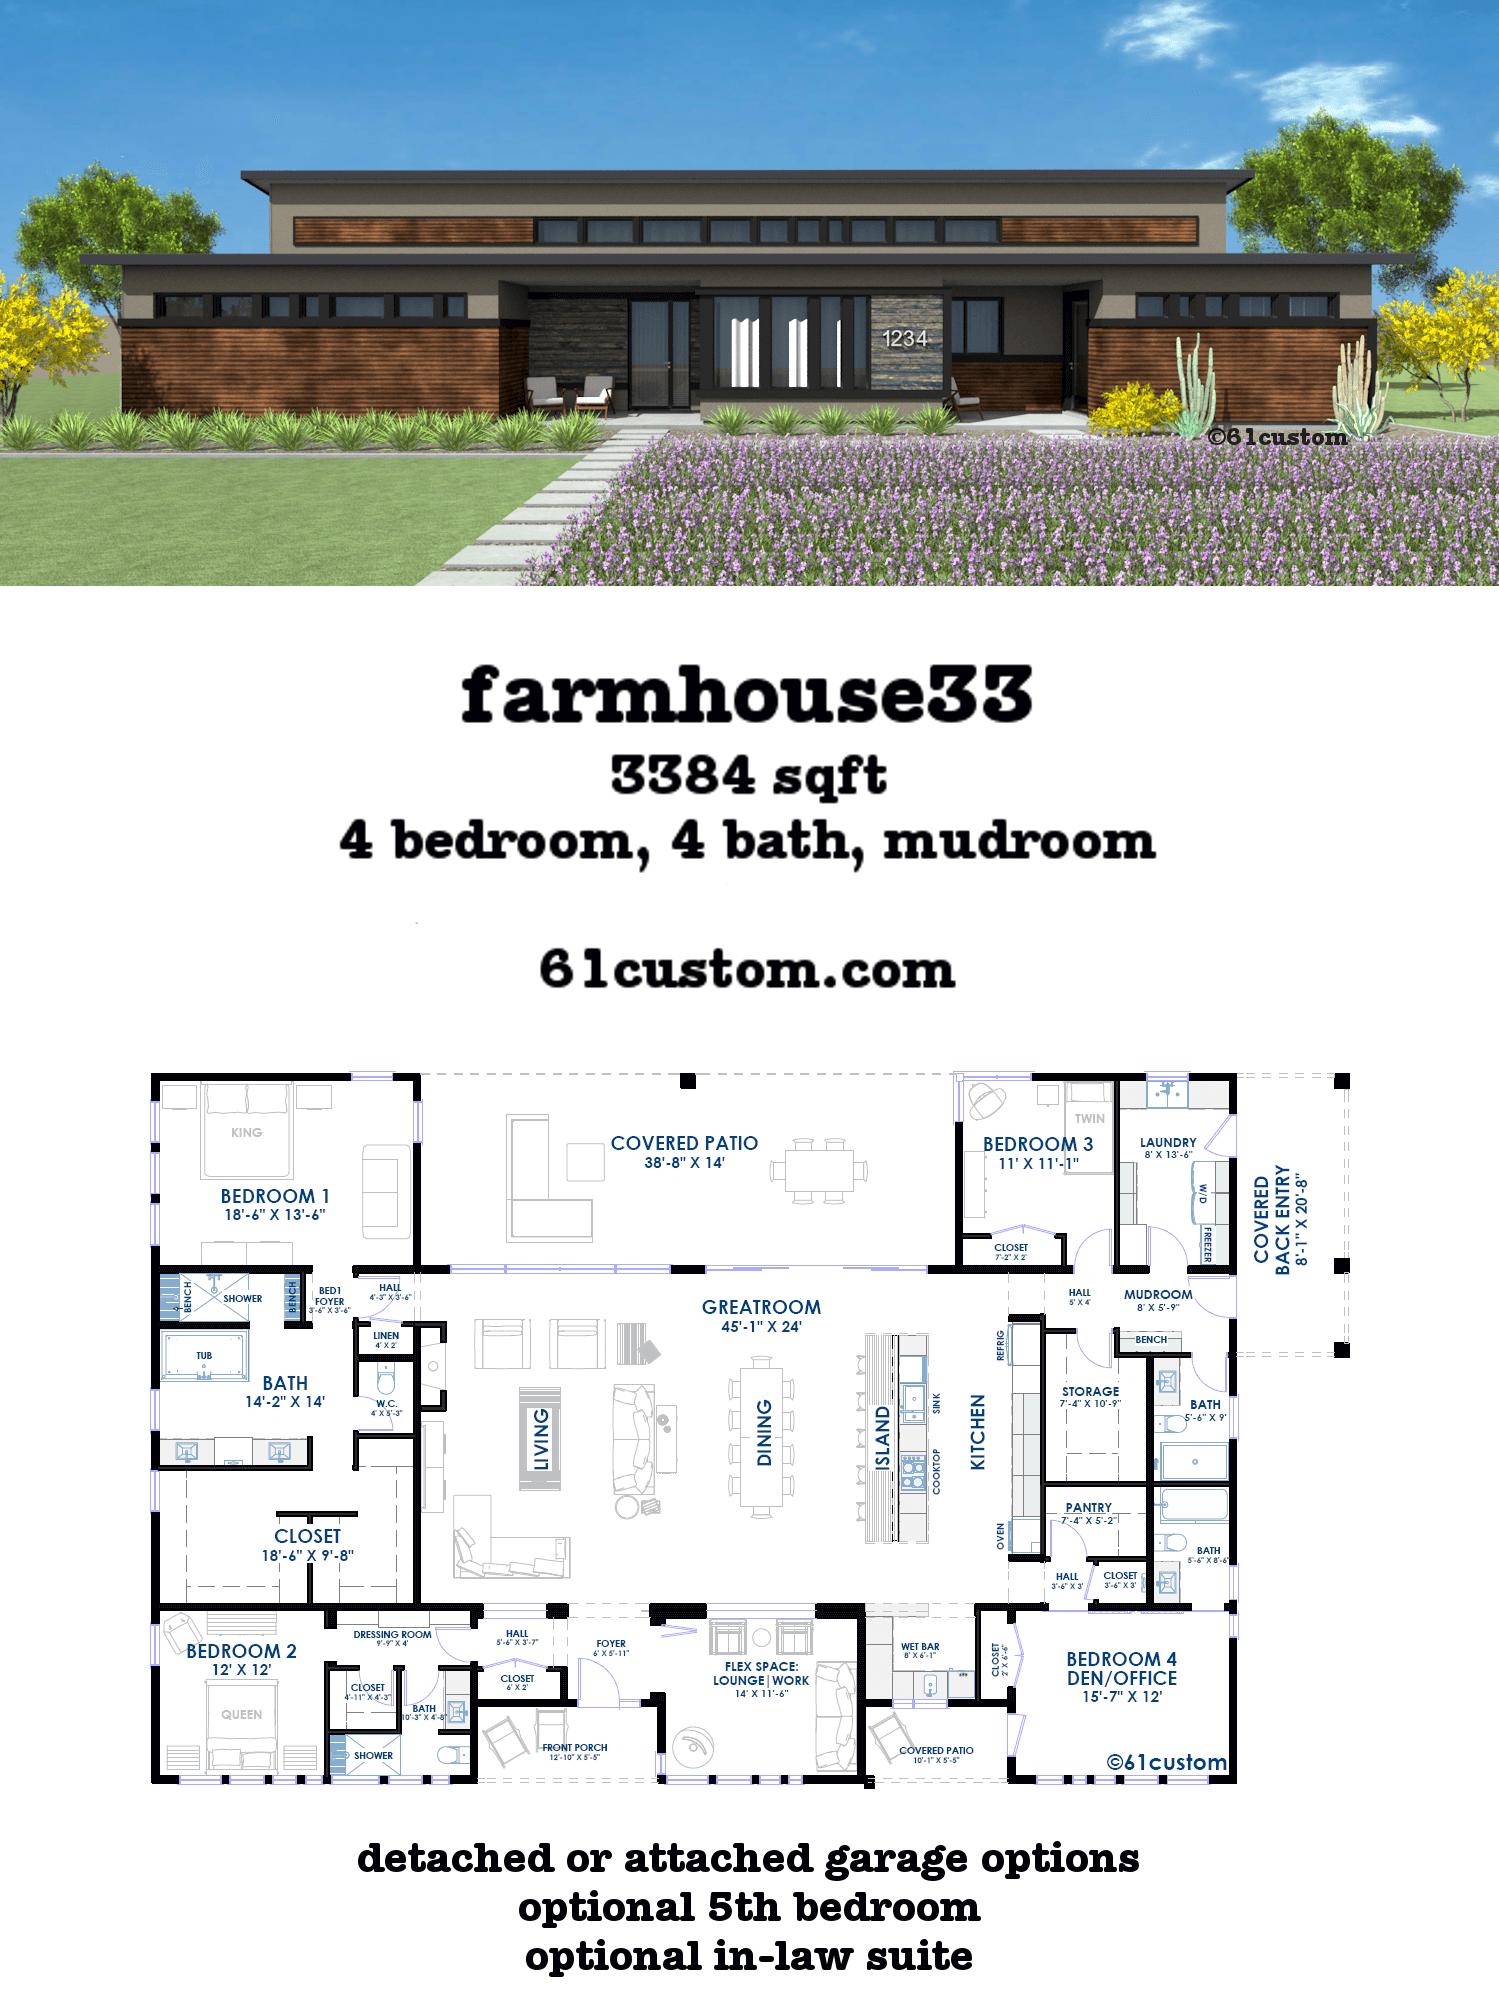 Modern Farmhouse Plan Farmhouse33 61custom Modern Farmhouse Plans Farmhouse Plans Dream House Plans